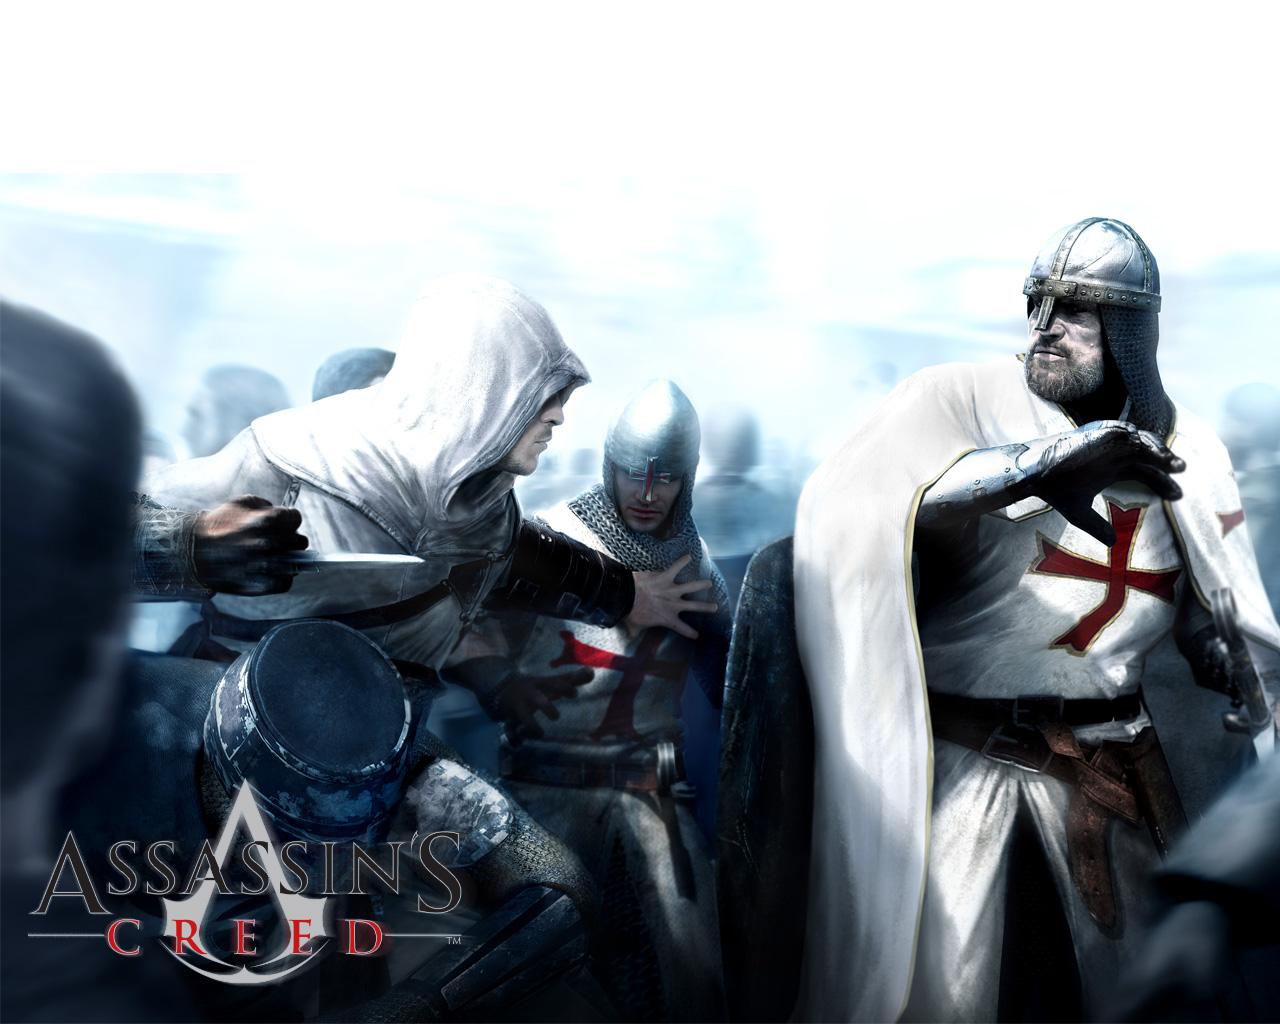 http://3.bp.blogspot.com/-ZRlXqUxXQ8I/Thh1ETA7ohI/AAAAAAAAF8w/fyZqDZxESzY/s1600/assassin%2527s-creed-wallpaper-hd-22.jpg